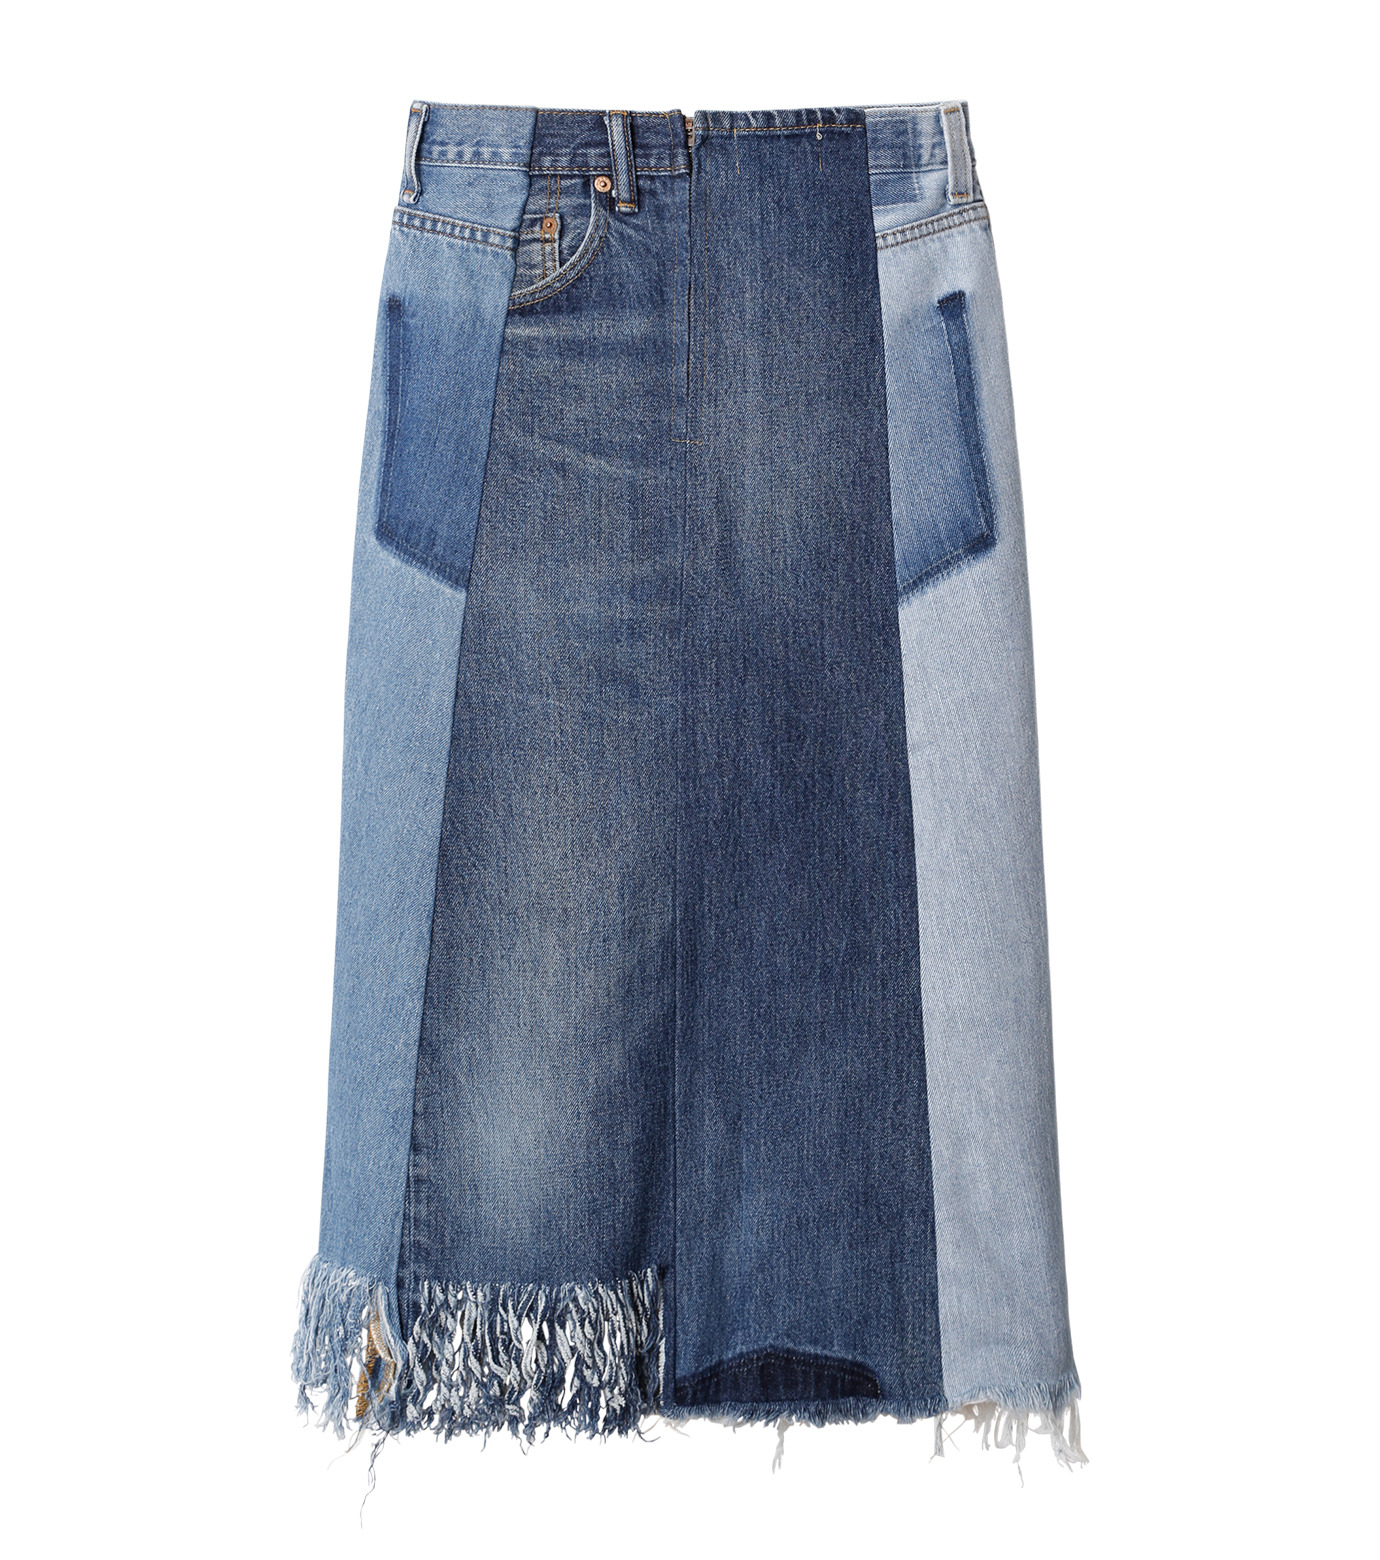 77circa(77サーカ)のFringe Denim Skirt-INDIGO(スカート/skirt)-cc16ss-49-94 拡大詳細画像2